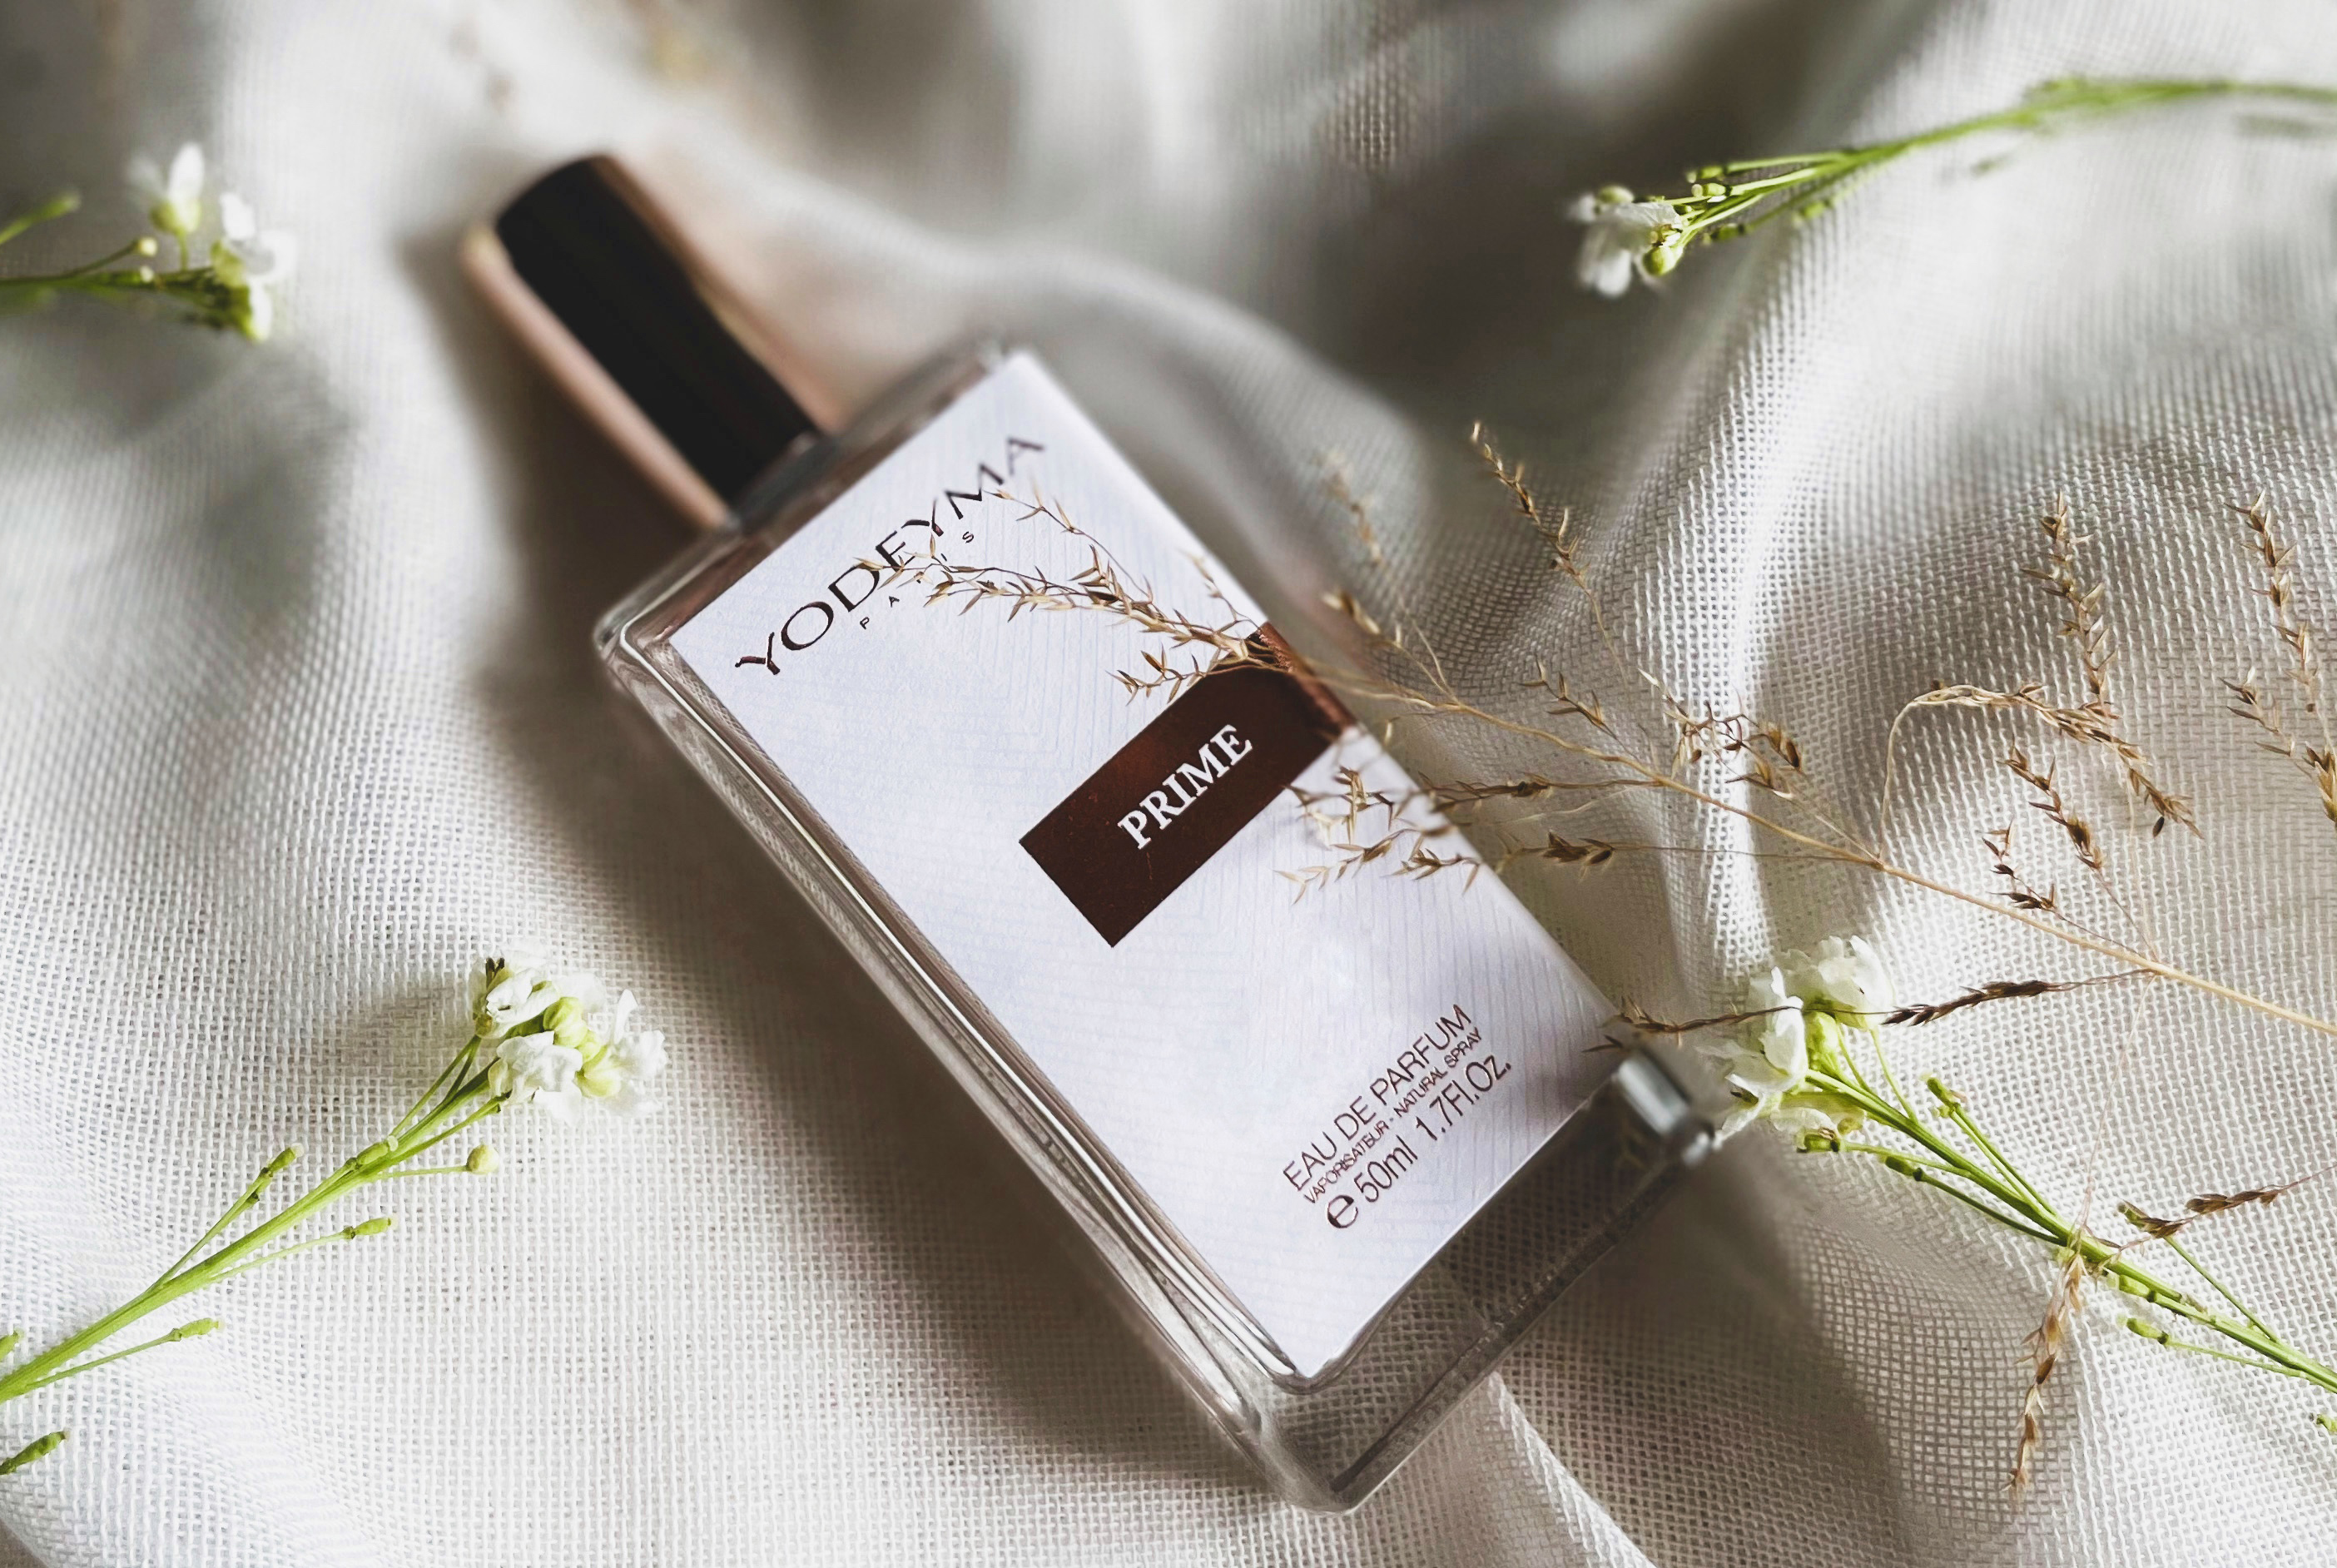 Objavte jedinečné kombinácie Yodeyma vôní